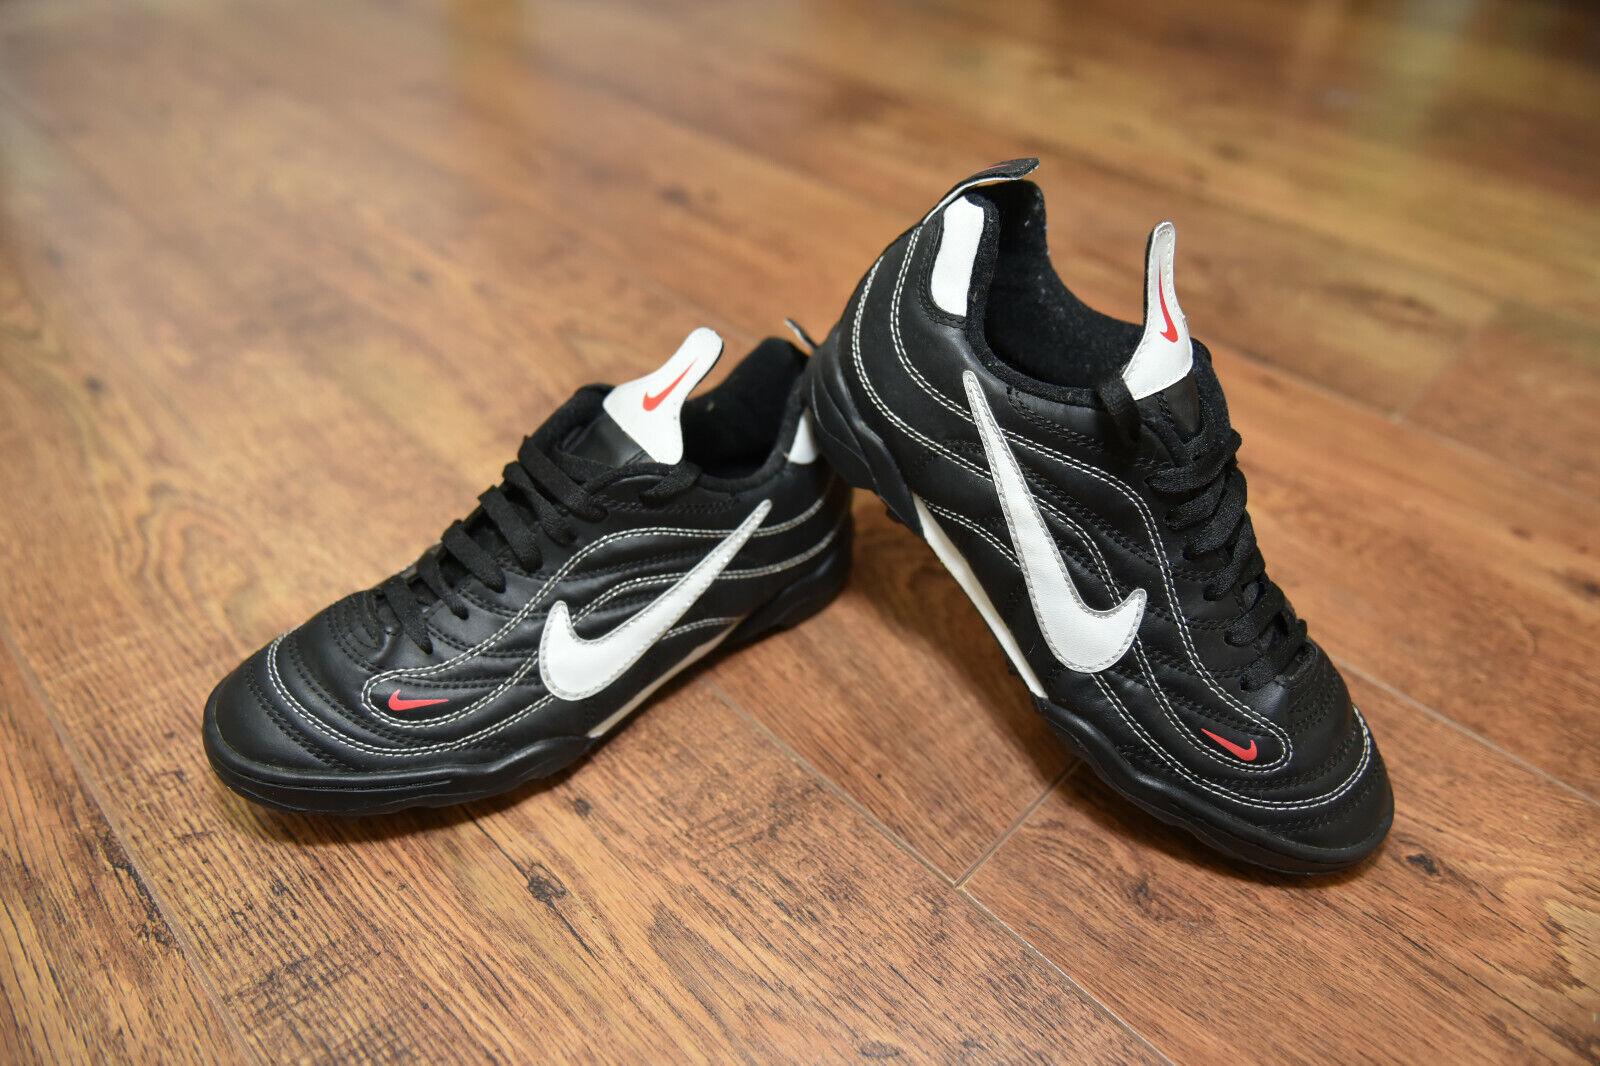 Nike Mercurial Pro 1998 AG Fútbol botas vapor R9 Astro Turf Talla 5.5 en muy buena condición